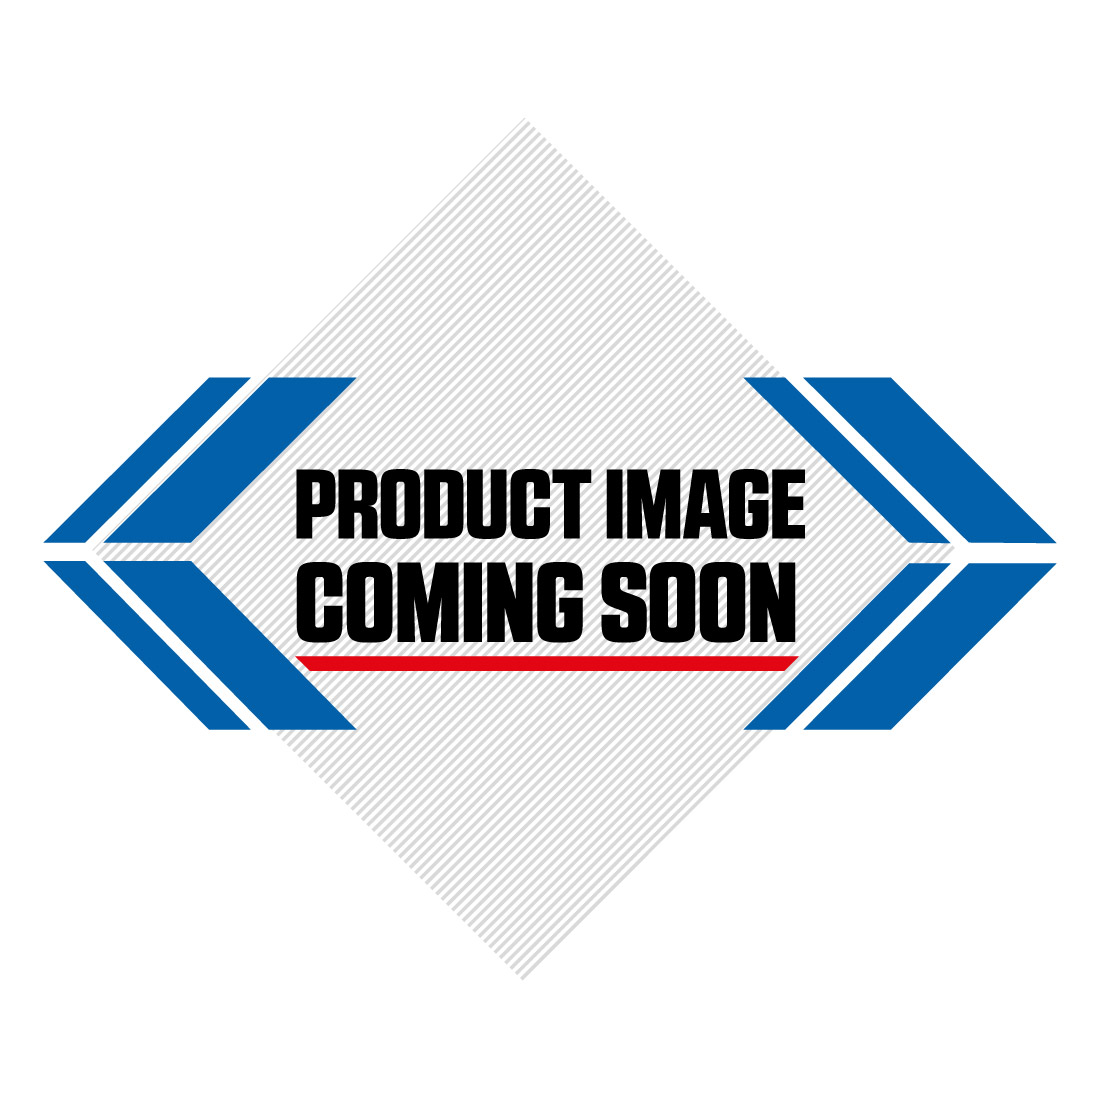 DJI Mavic Pro Fly More Combo 4K Quadcopter Drone Image-4>